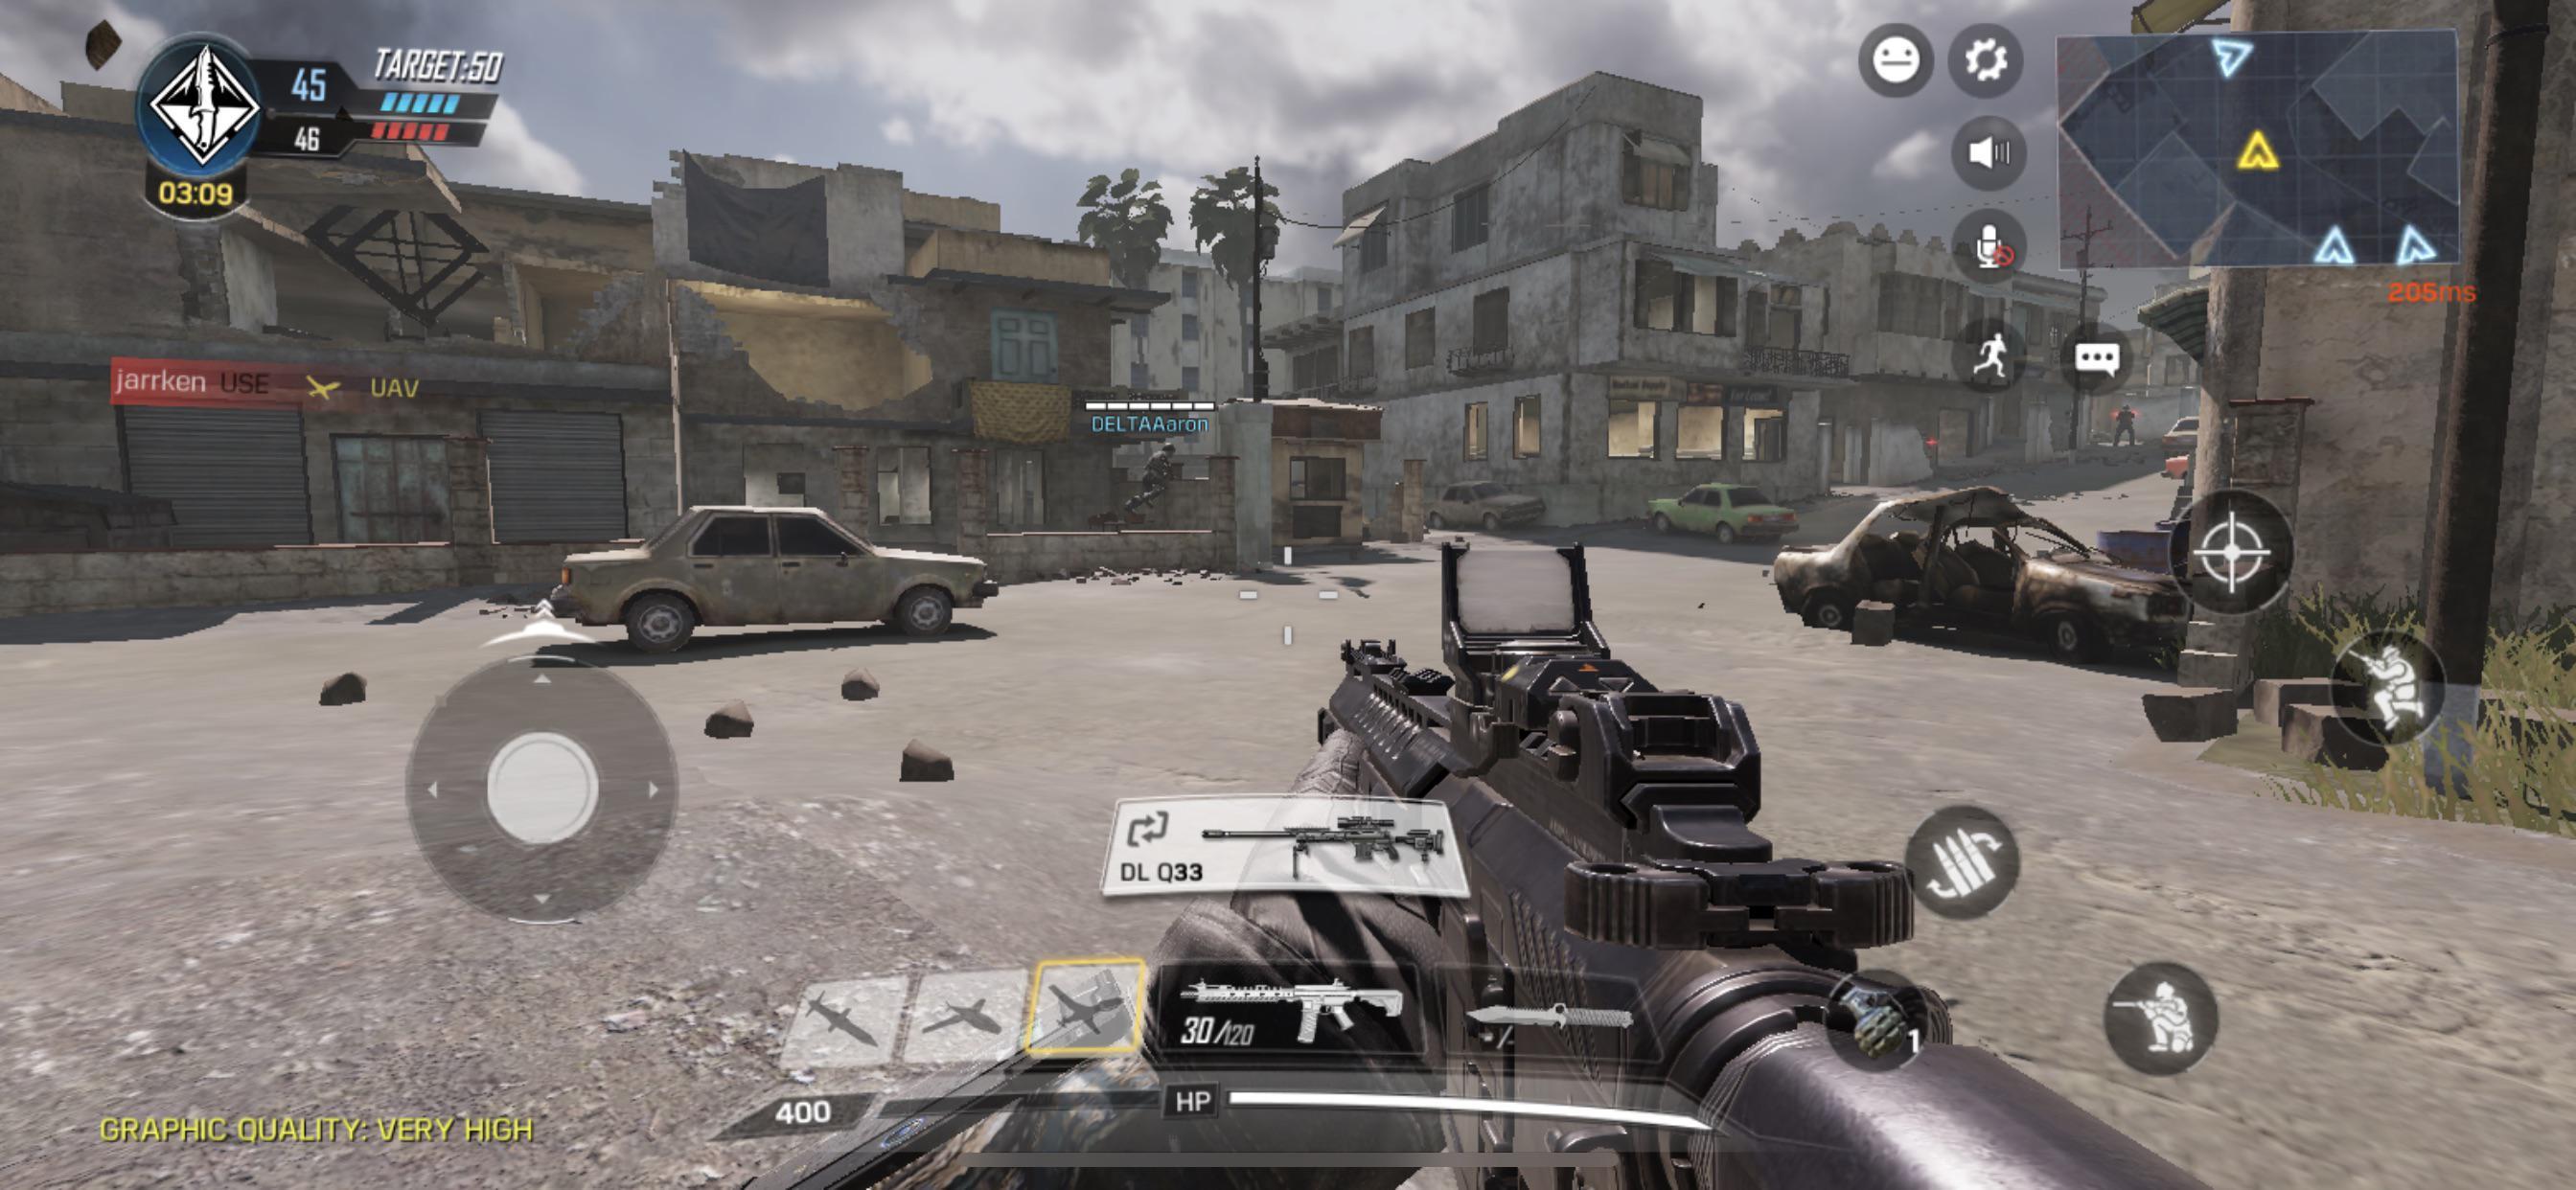 COD Mobile Screenshot 2